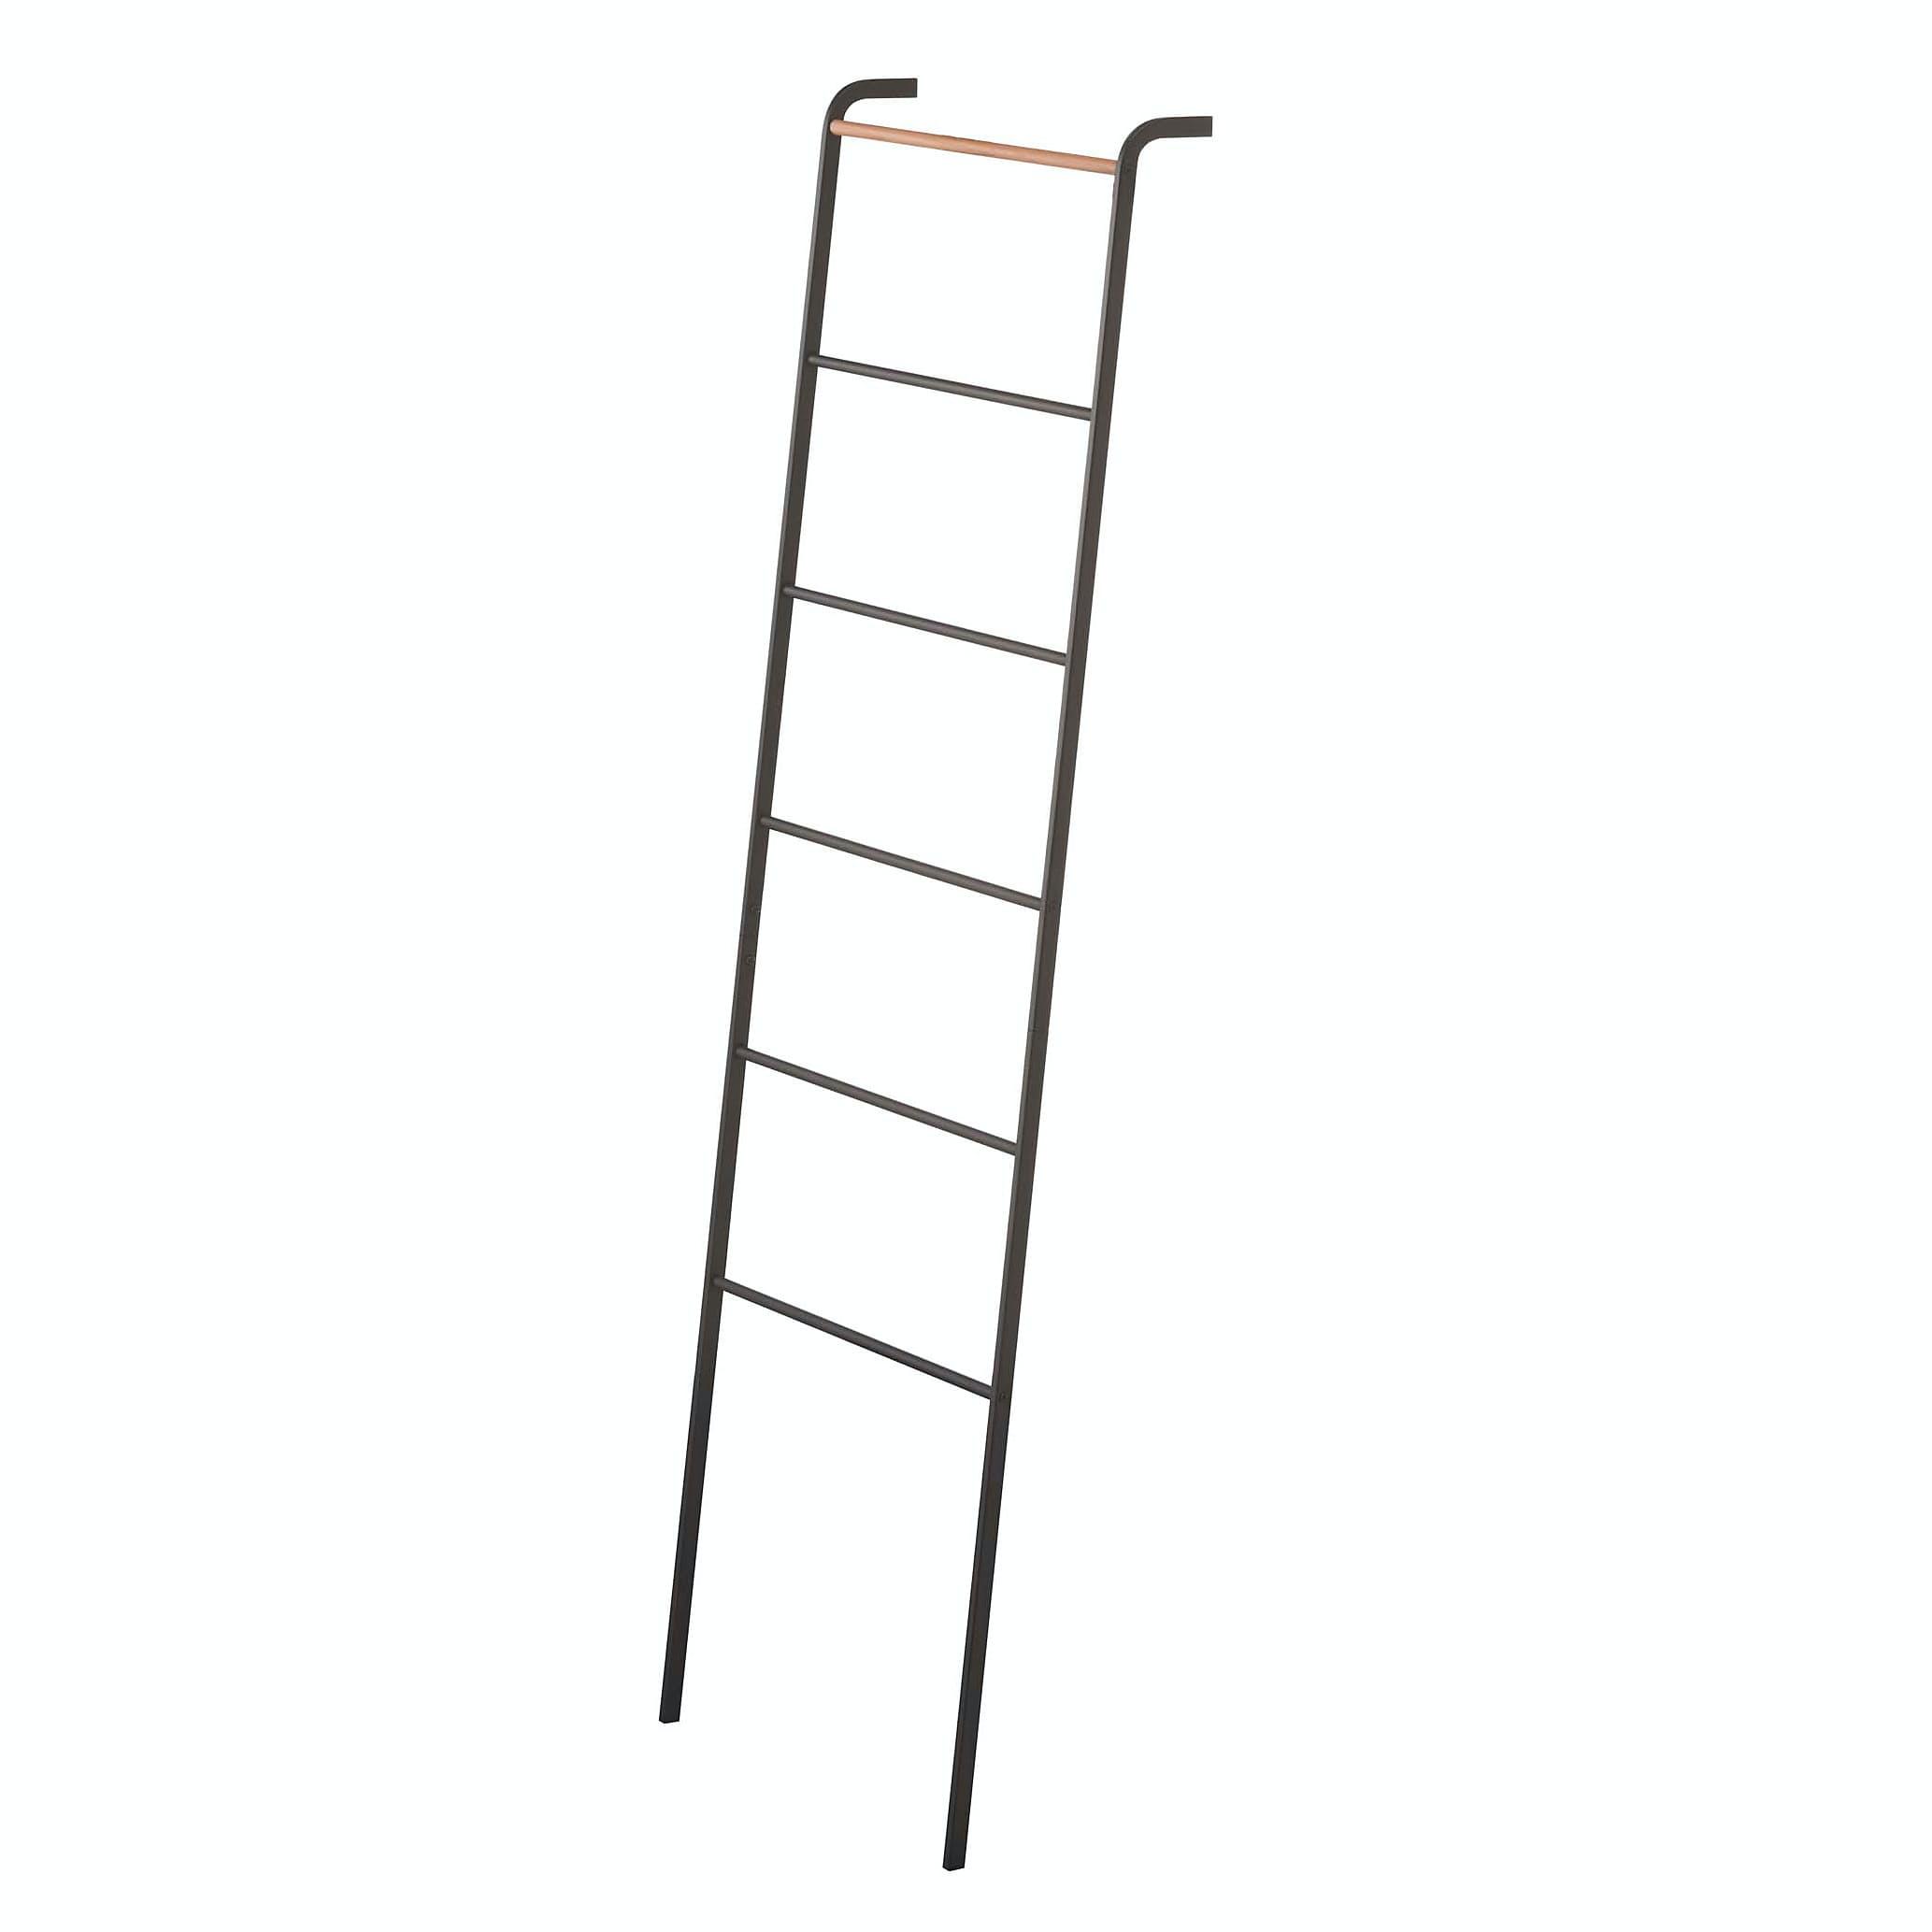 J096pqesbm yamazaki tower leaning ladder rack 0 original